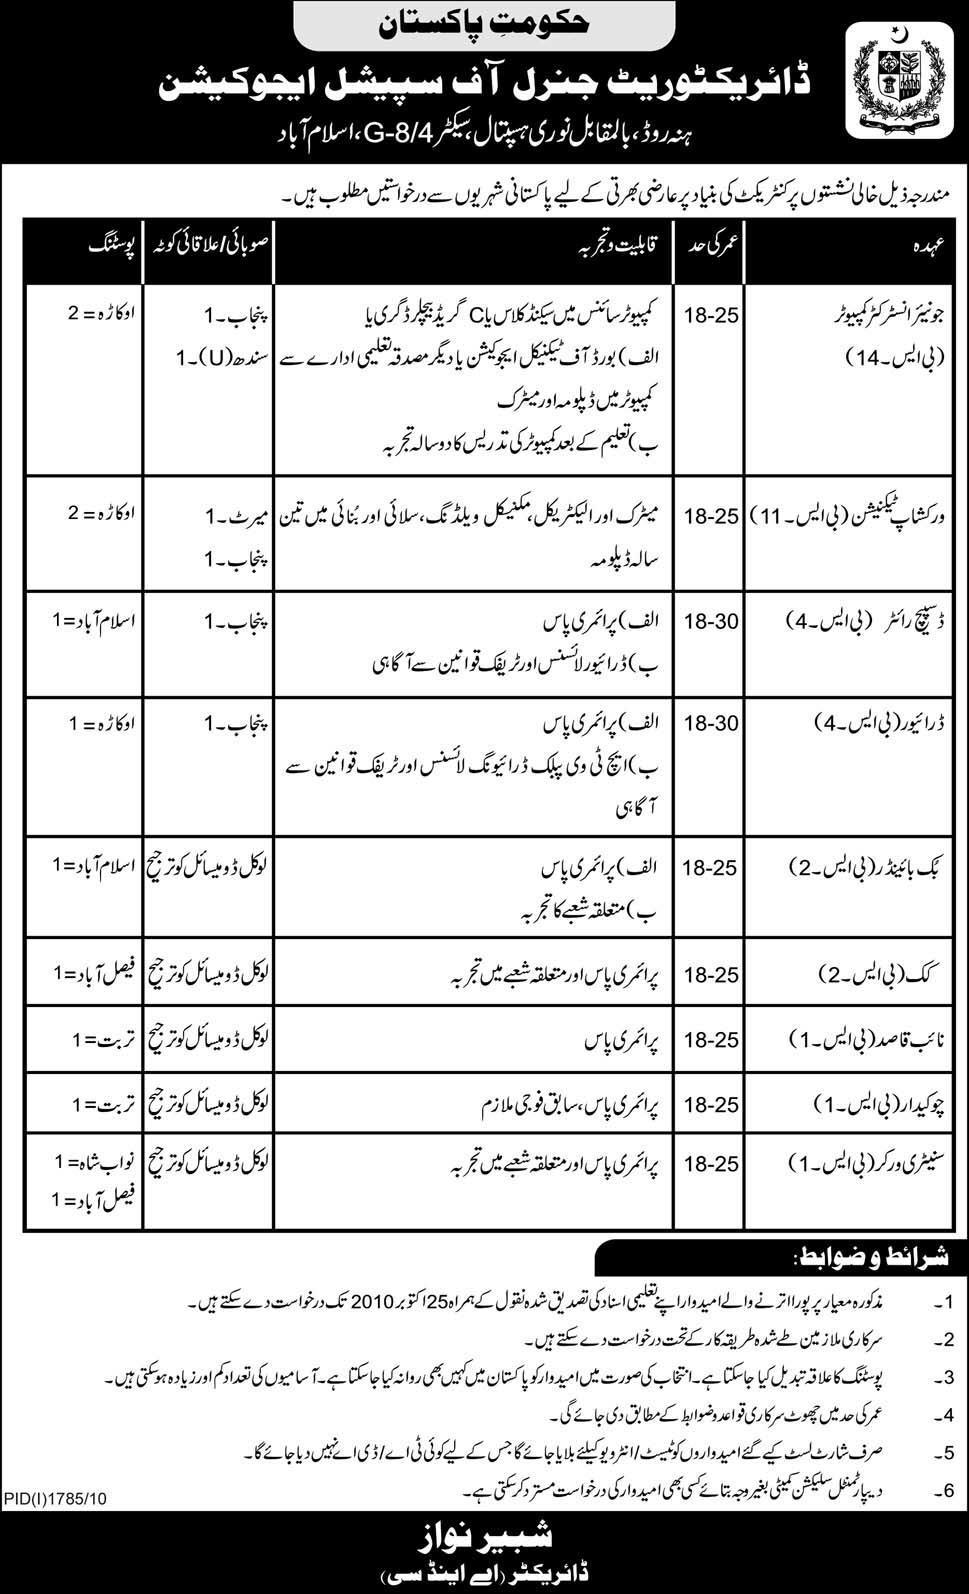 Special Education Department Pakistan Jobs | PaperPk Blog